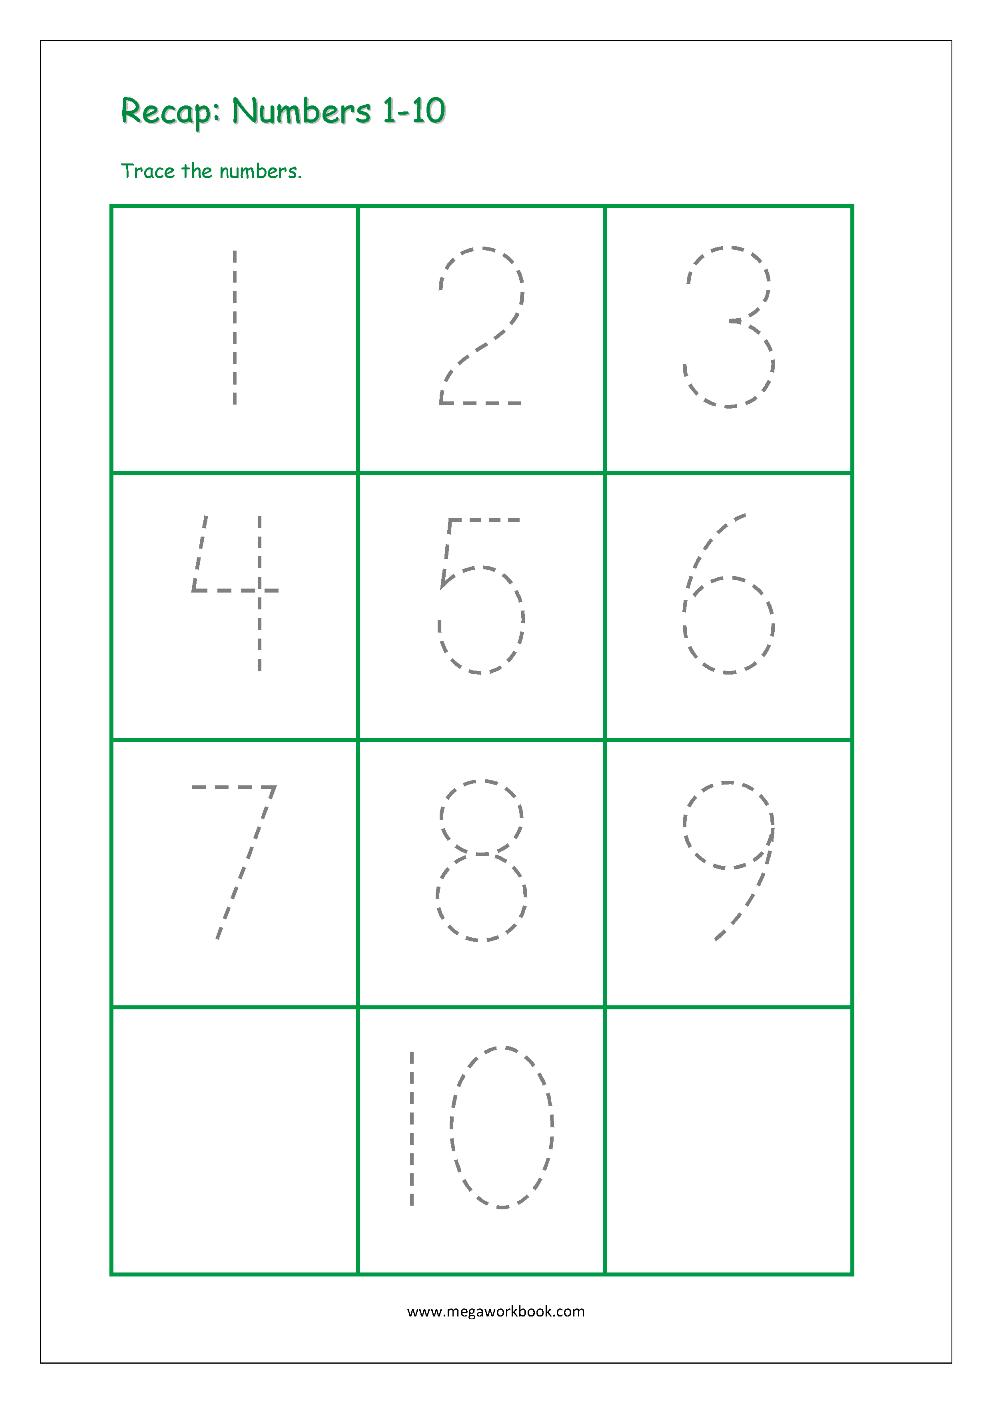 Number Tracing - Tracing Numbers - Number Tracing Worksheets